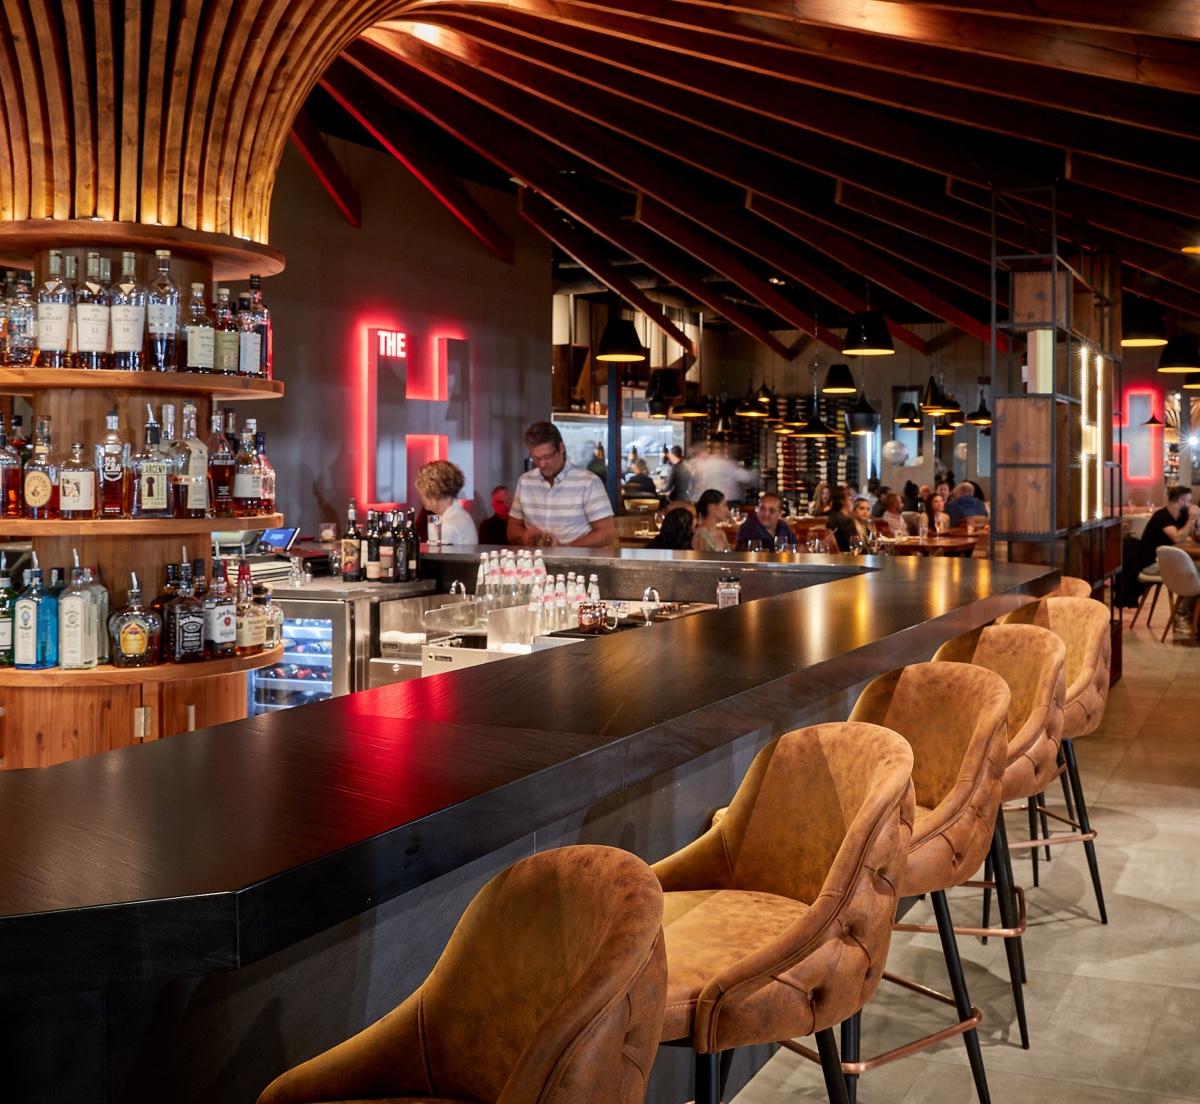 The H Bar